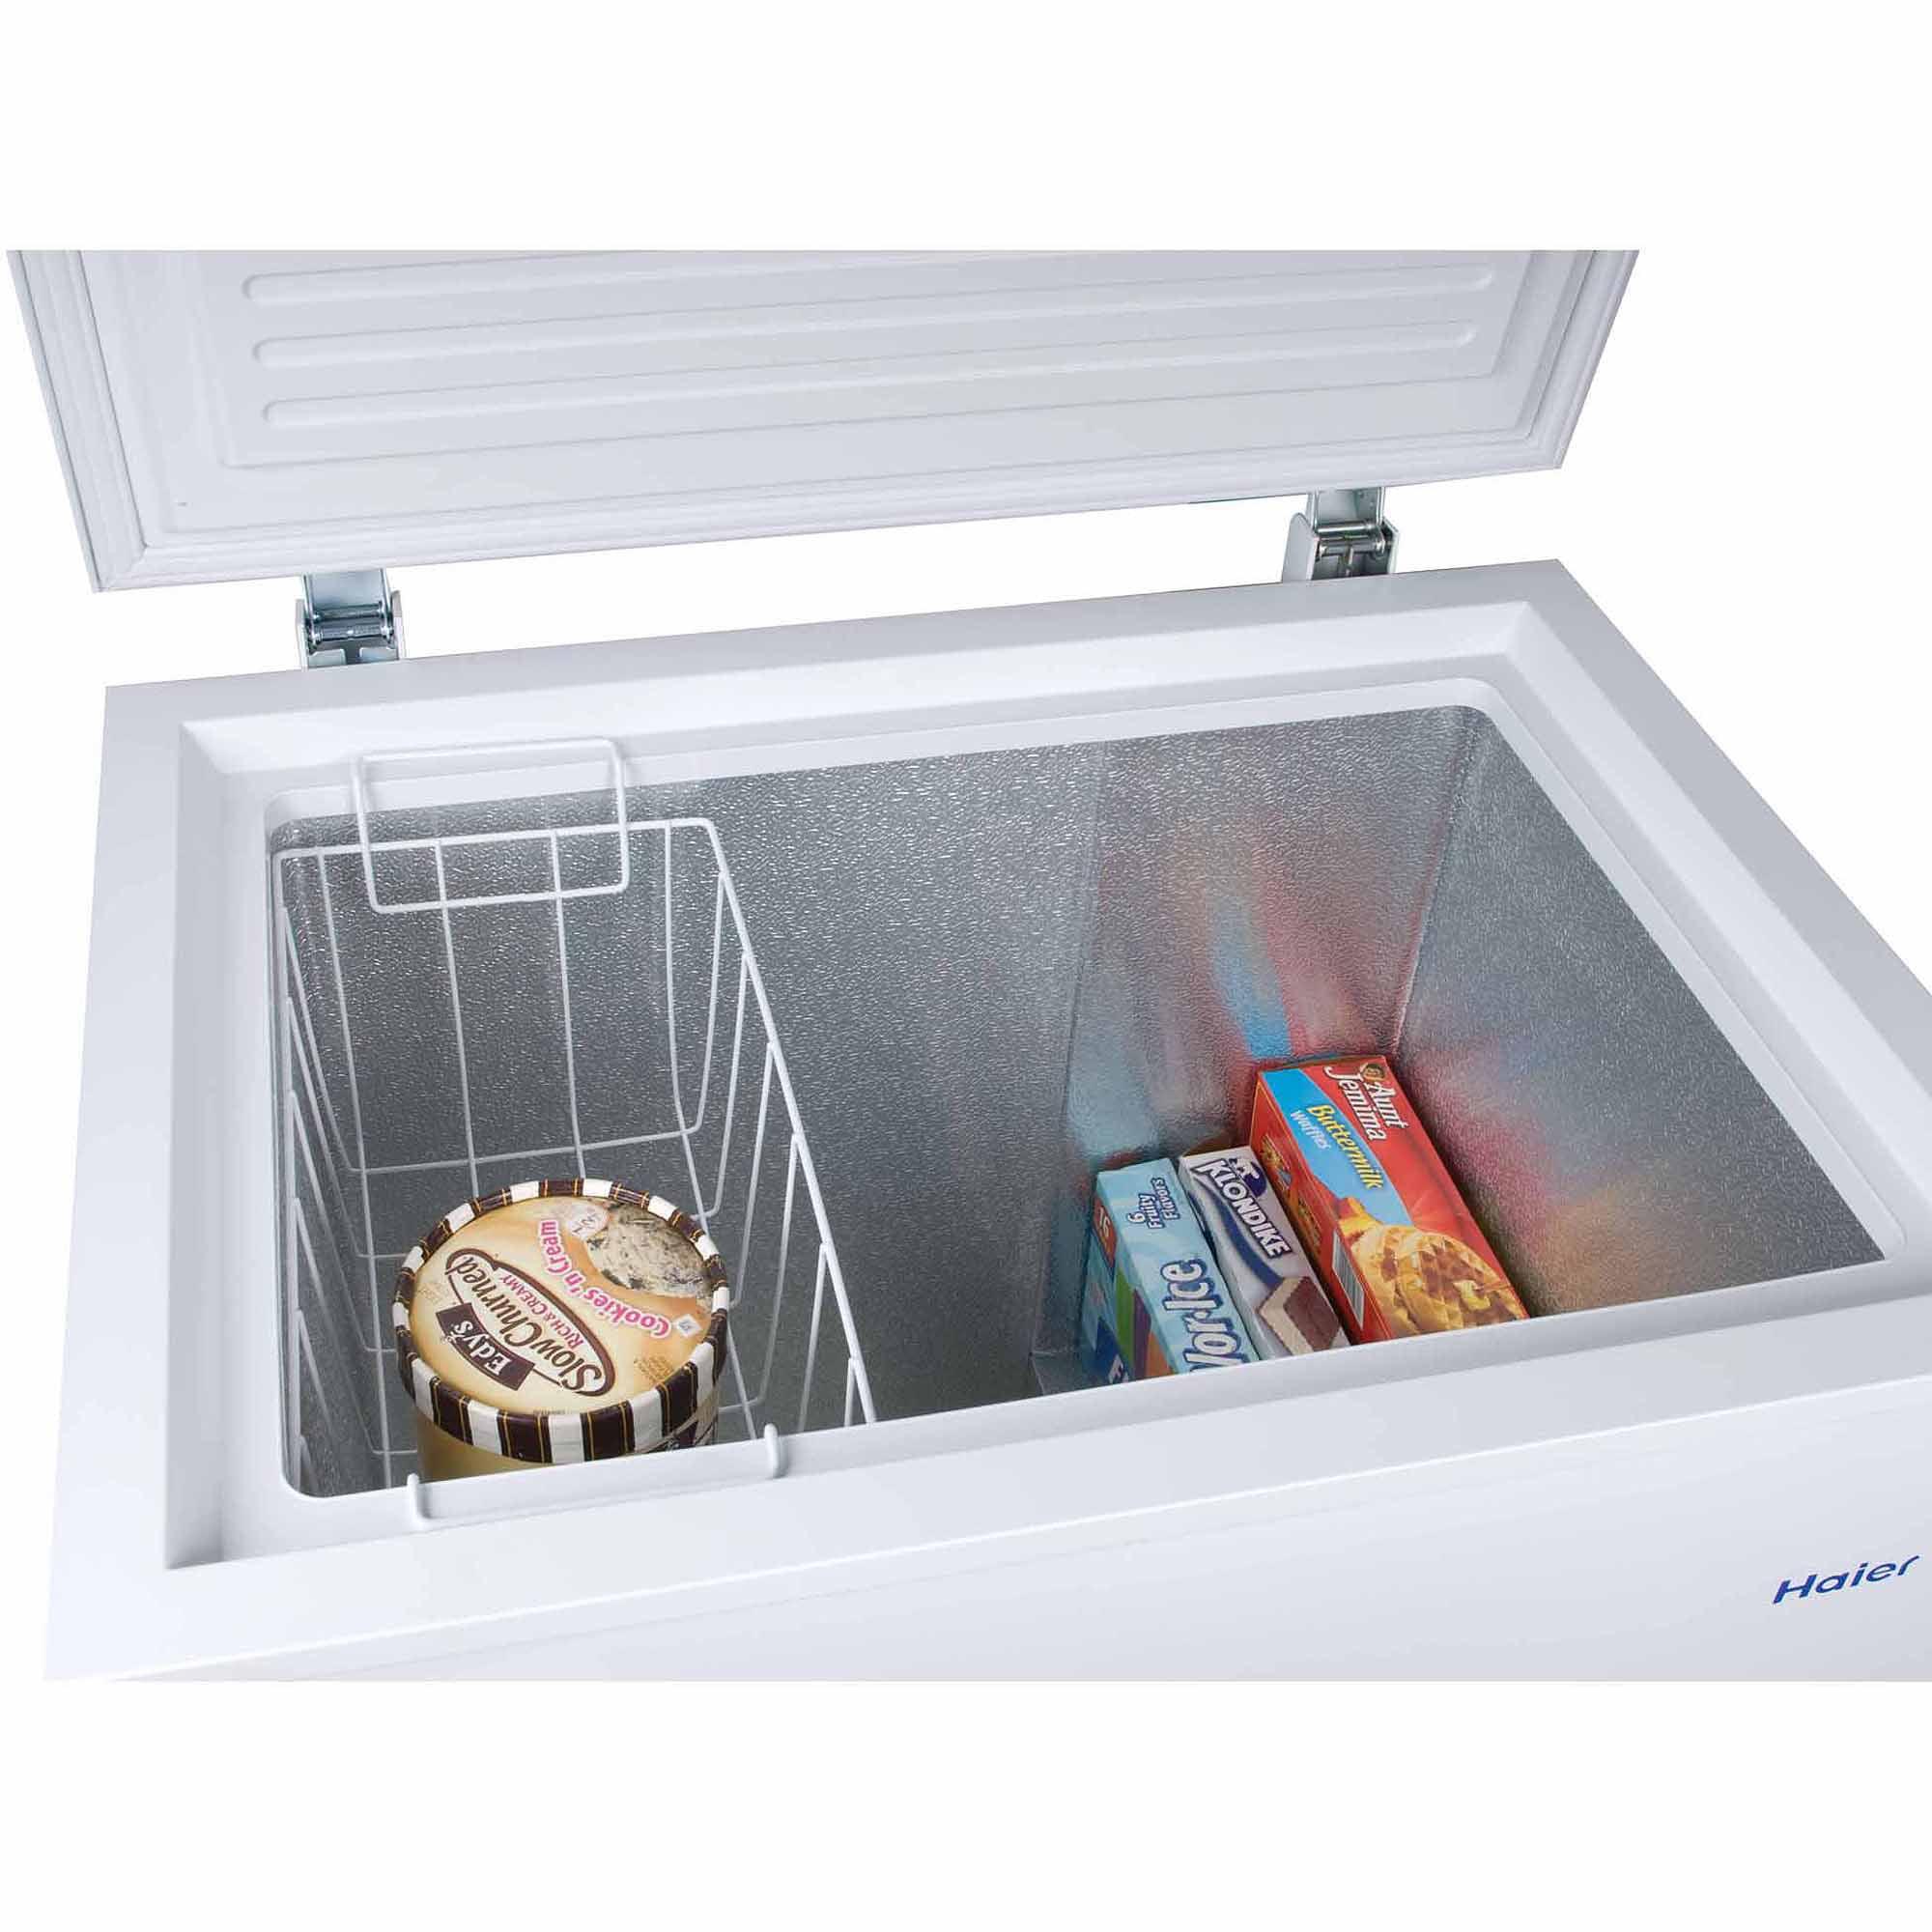 Haier 50 cu ft Capacity Chest Freezer White HF50CW20W Walmartcom